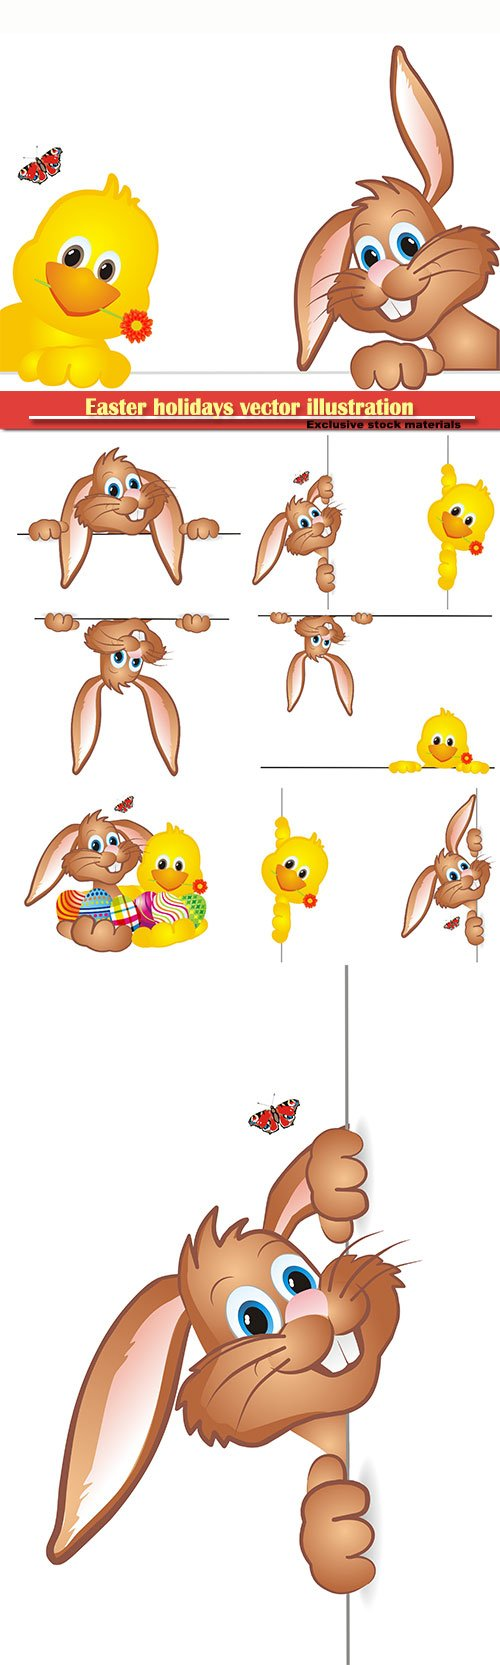 Easter holidays vector illustration # 4